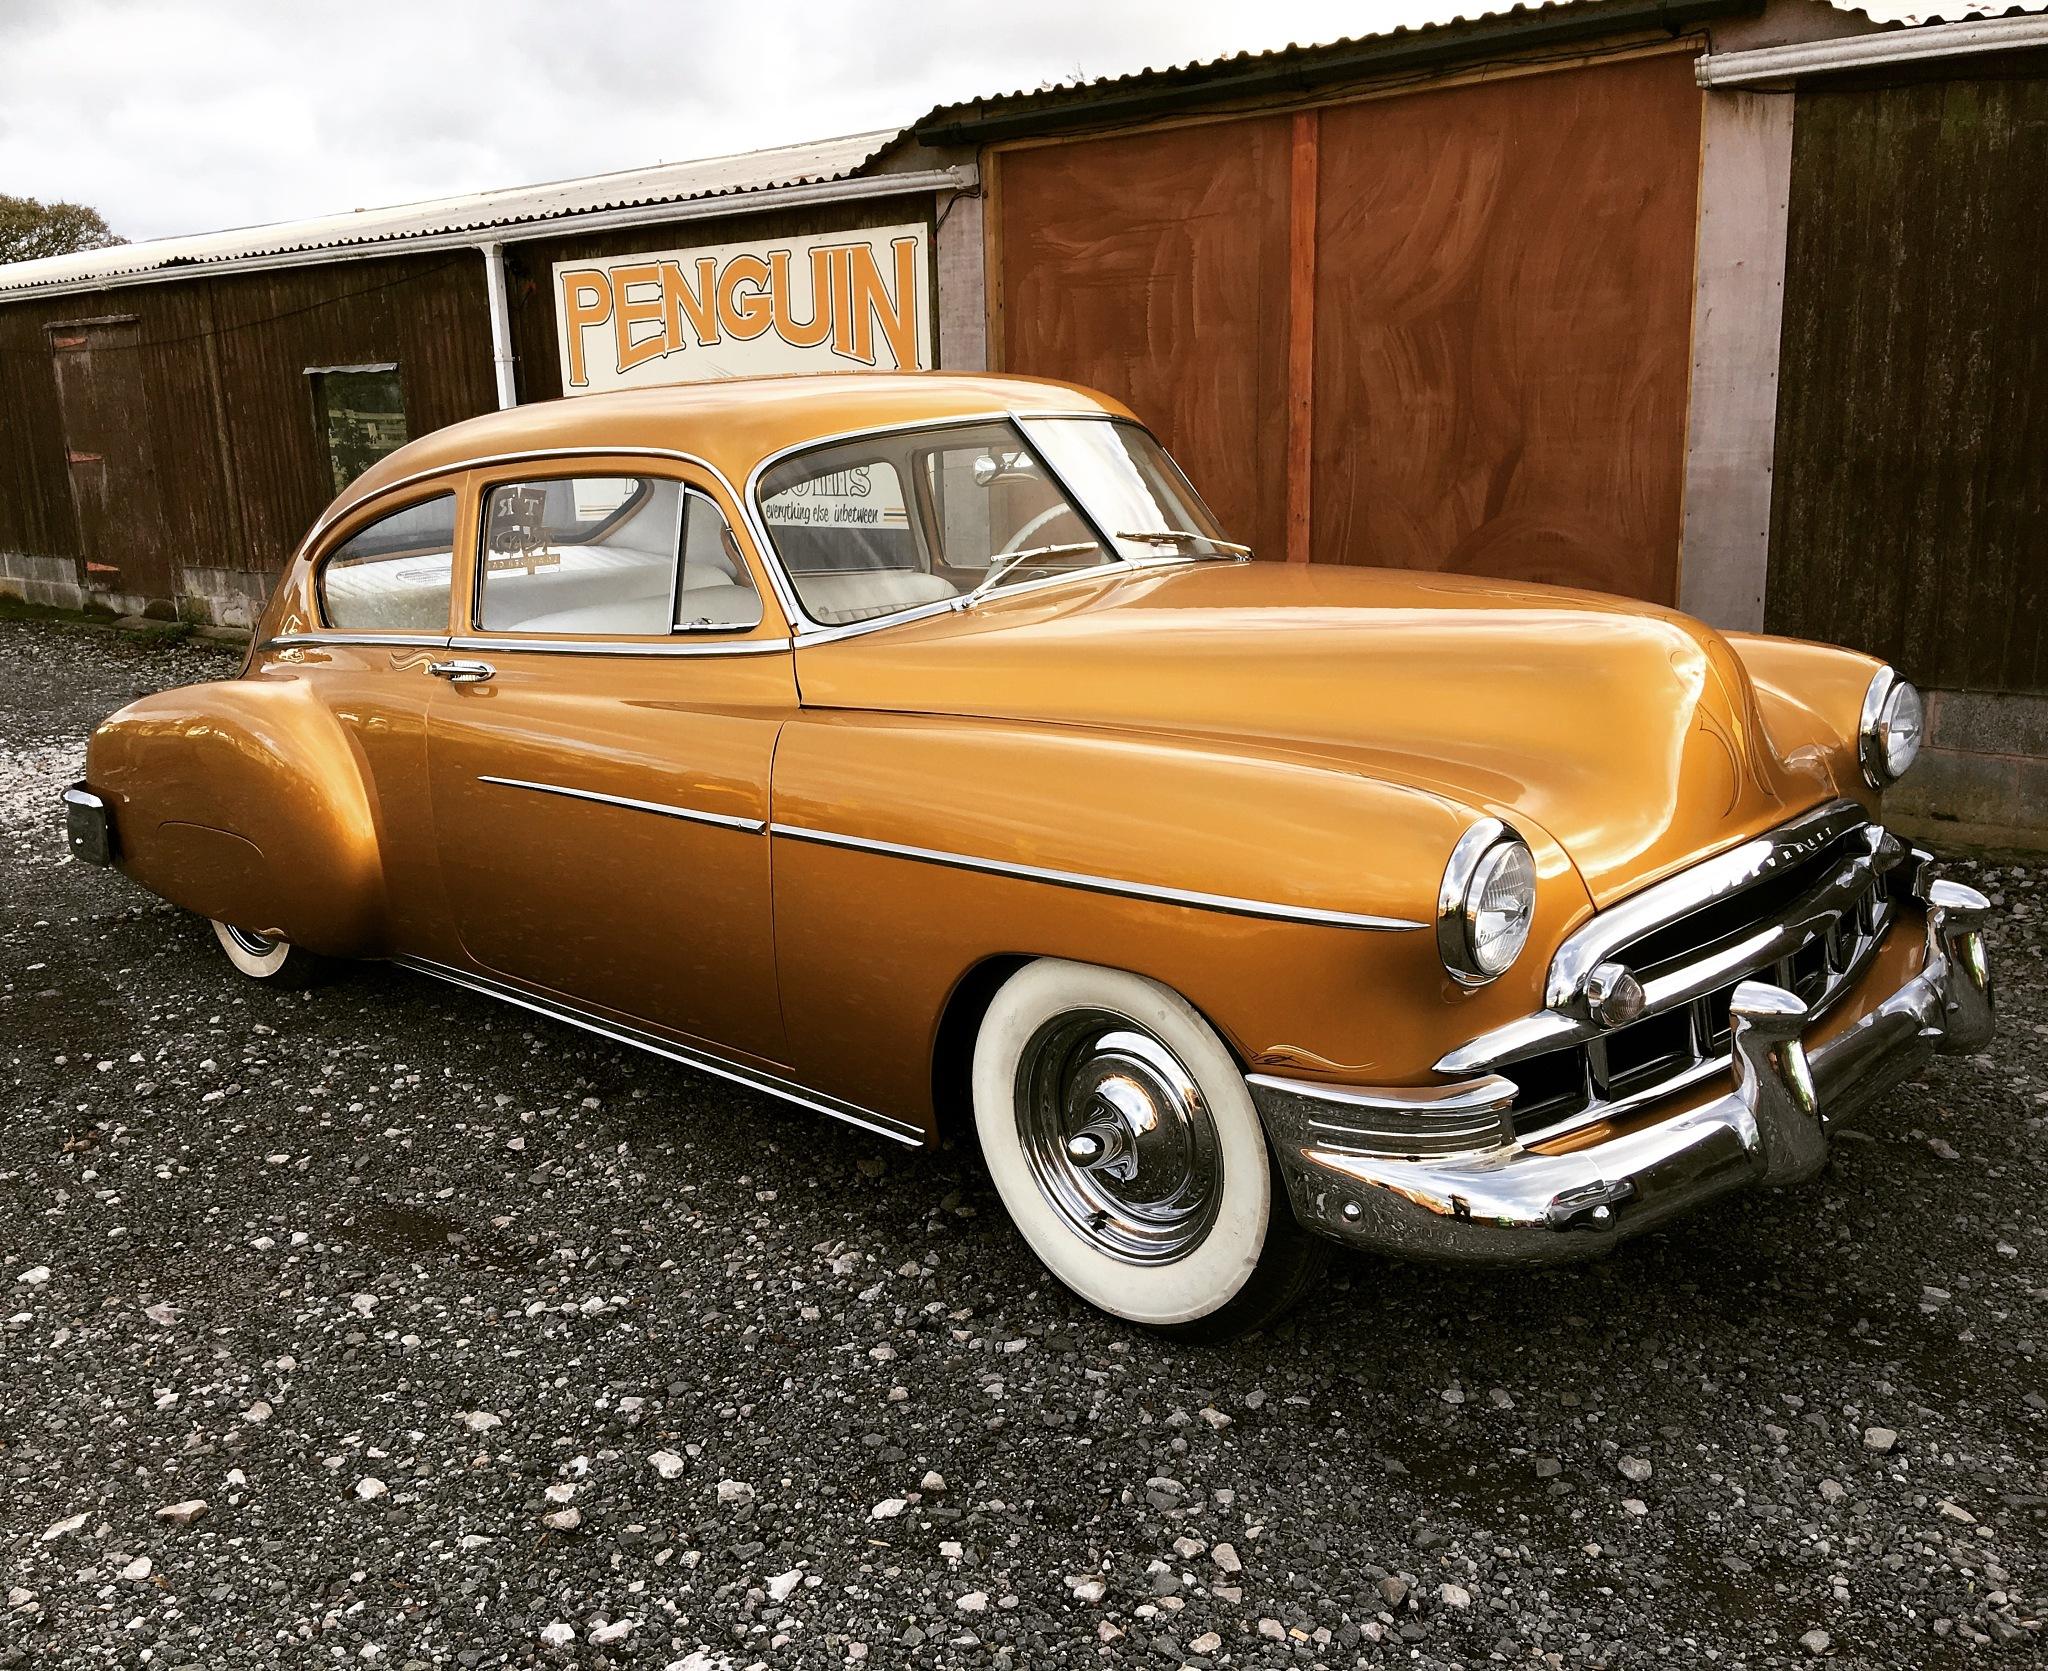 My 1949 Chevrolet Fleetline  by Steve Walch